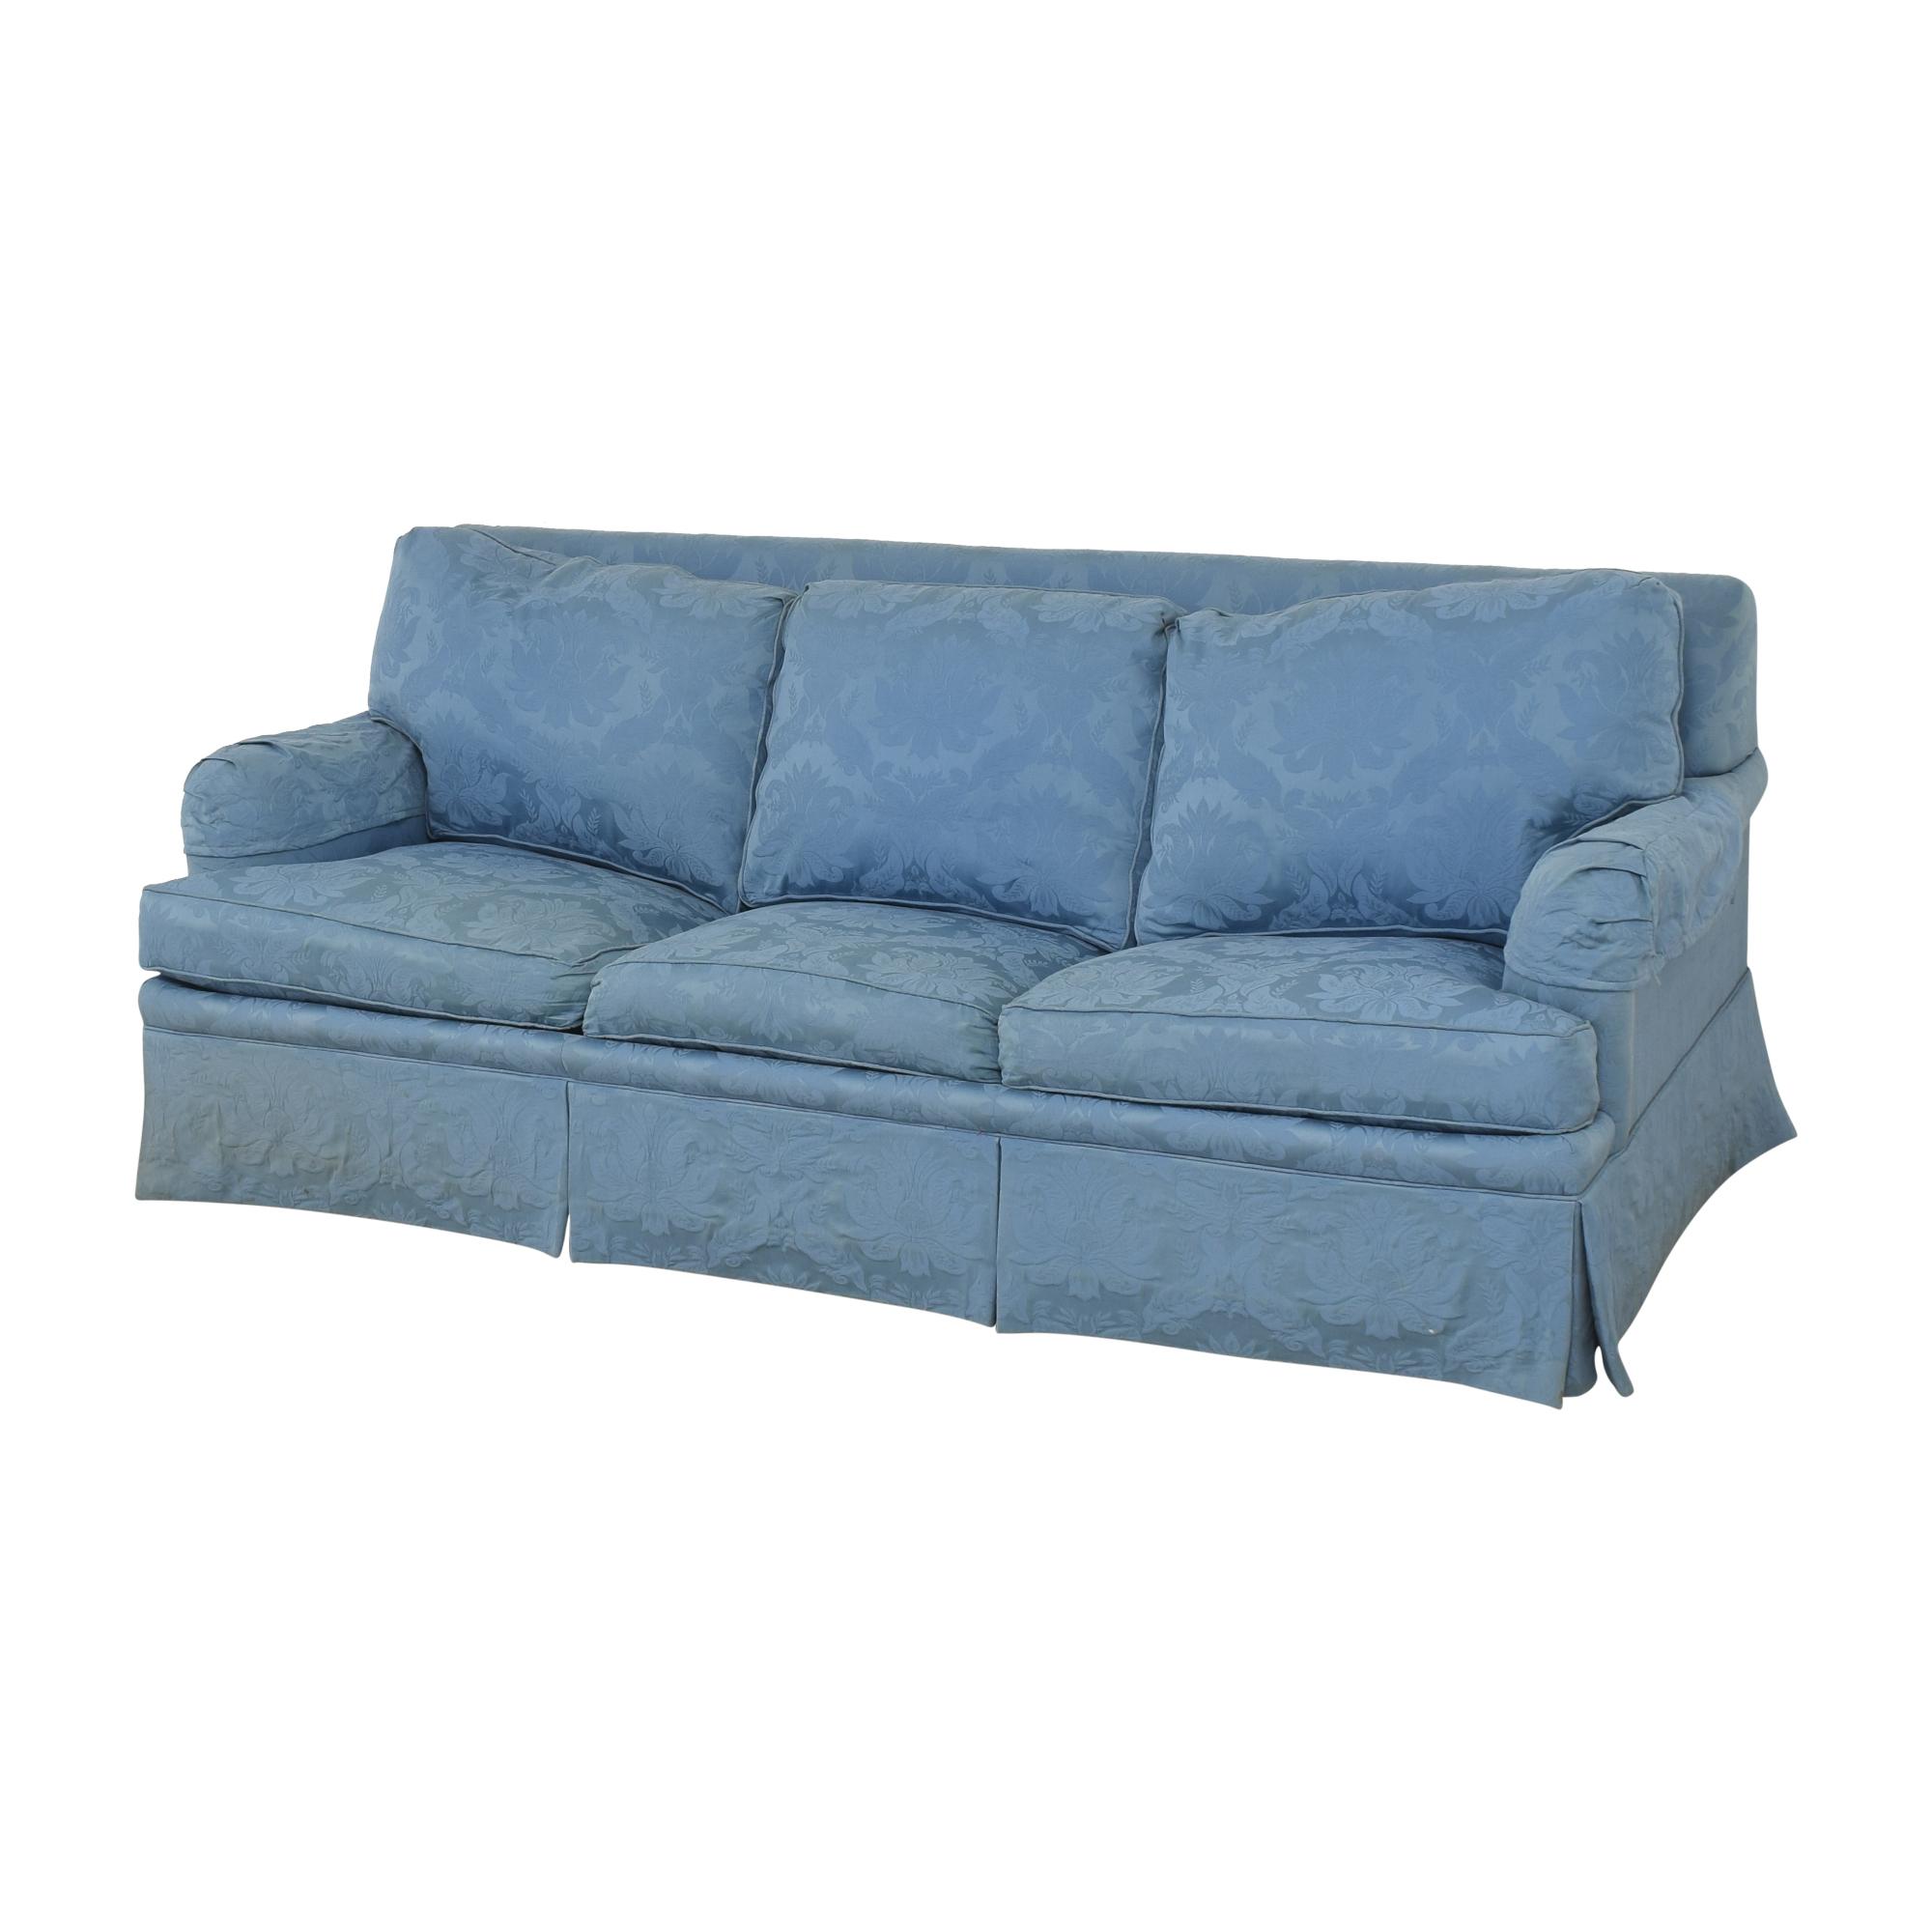 buy Sherrill Furniture Damask Sleeper Sofa Sherrill Furniture Sofa Beds